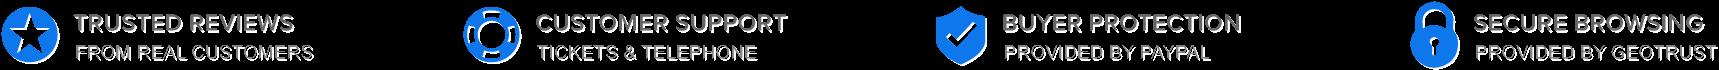 np-menu-banner